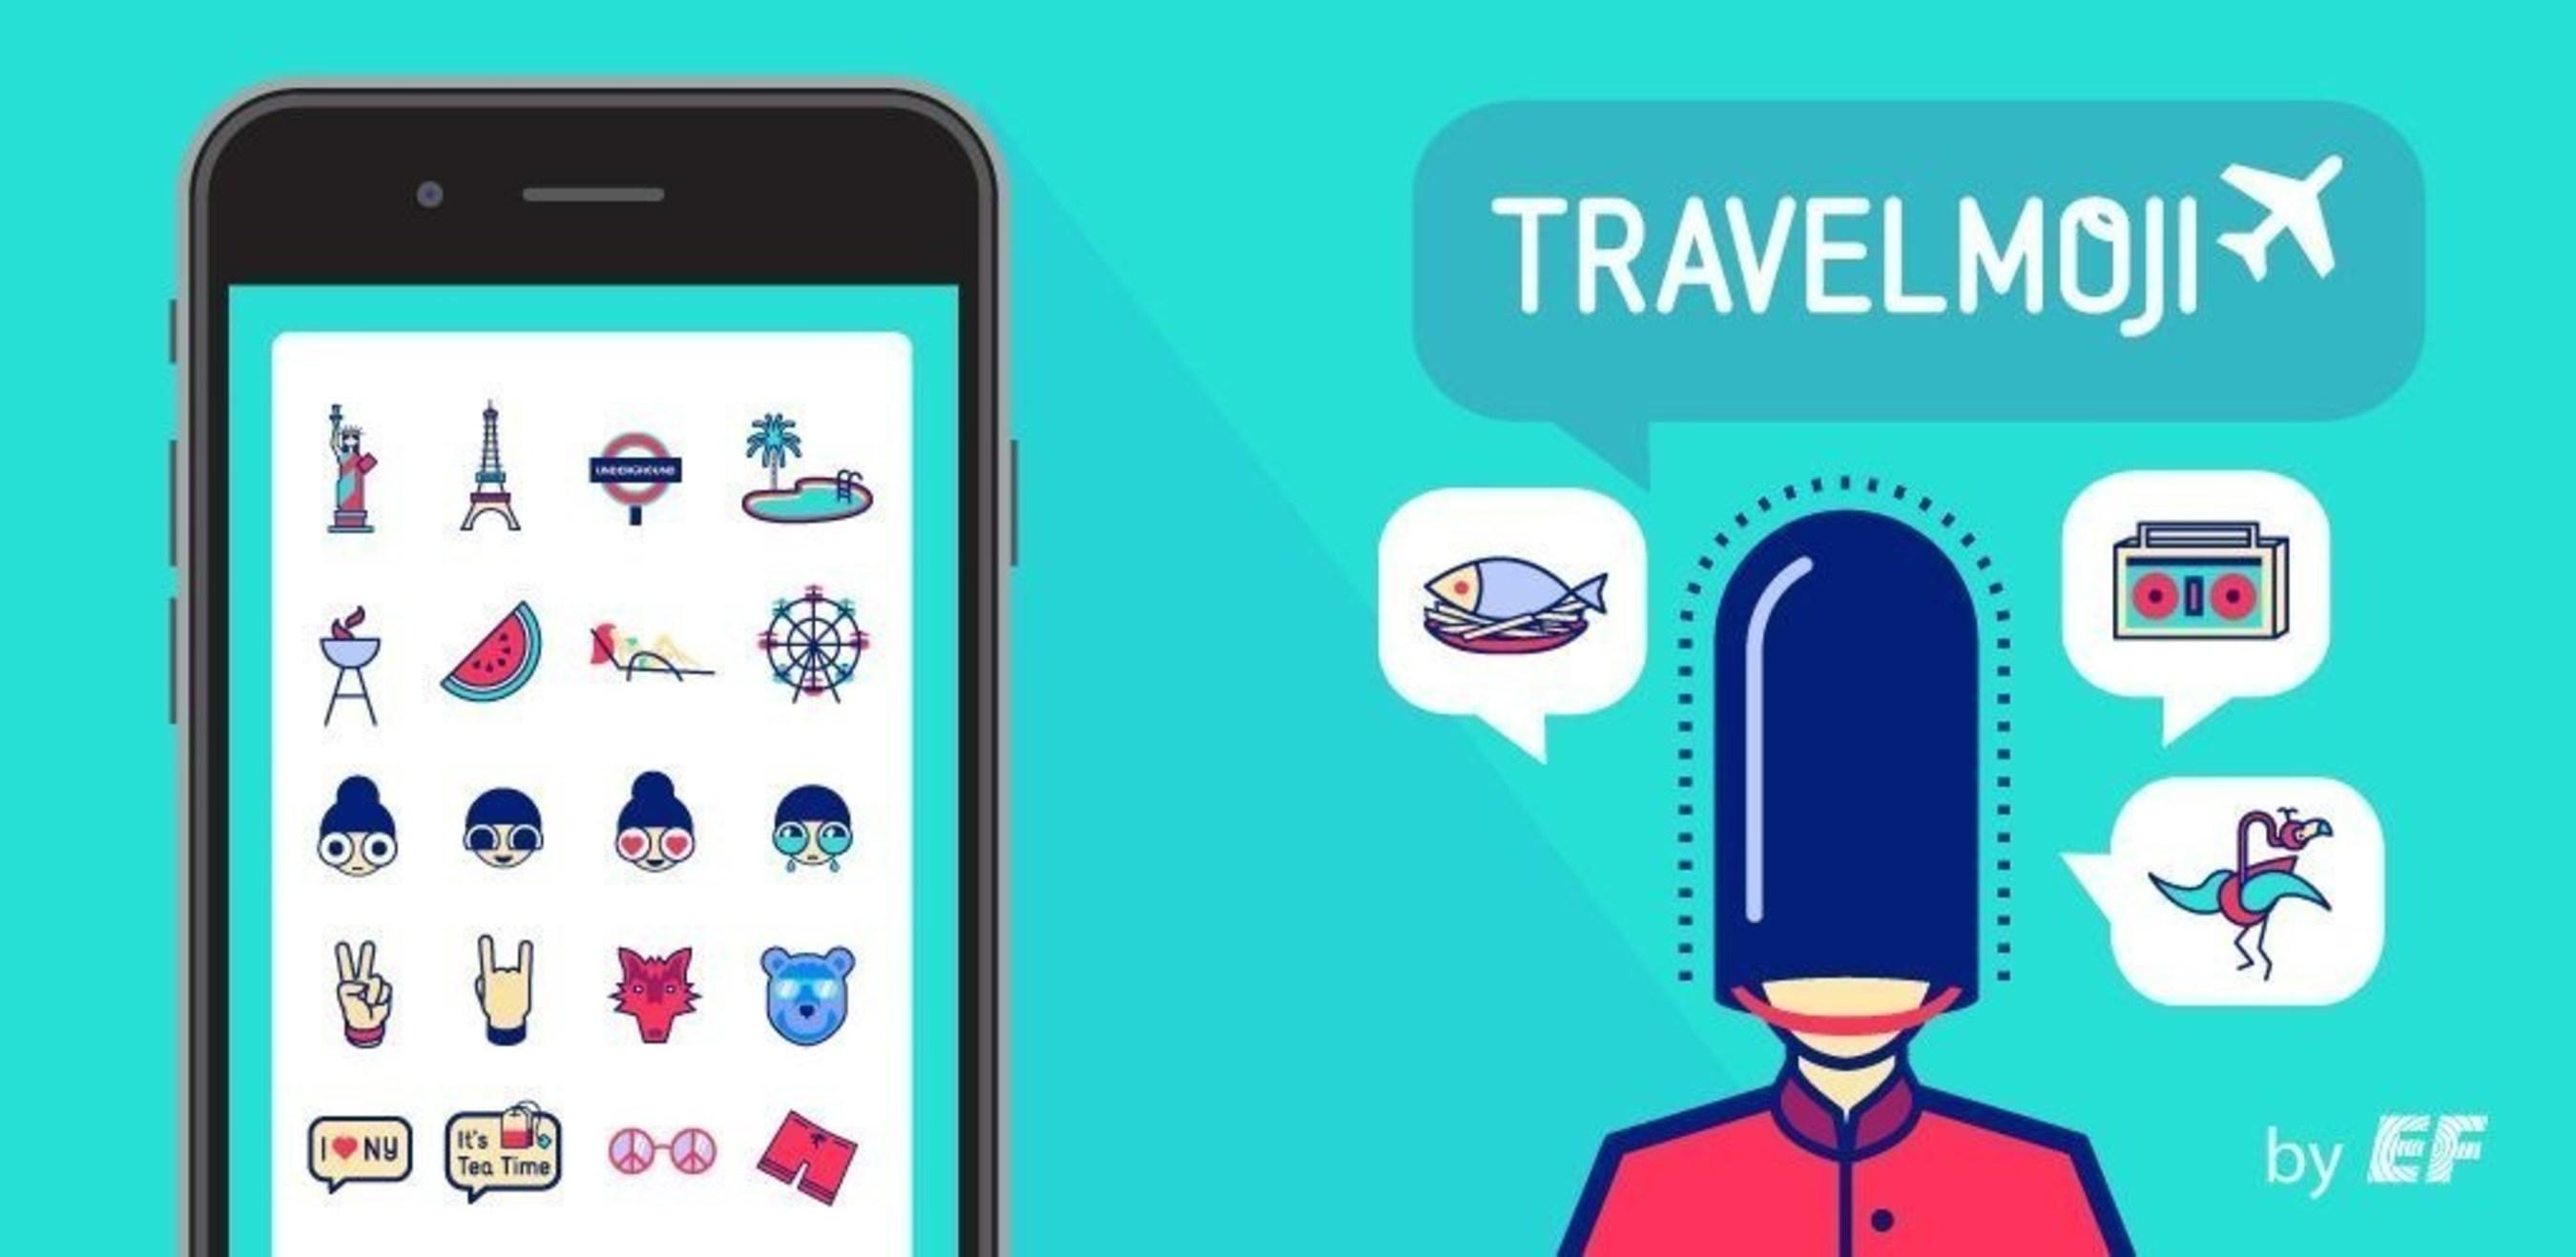 EF Education First presents Travelmoji, an emoji keyboard dedicated to summer, travel, sun and fun. Download Travelmoji from AppStore (iOS) or Google Play (Android) (PRNewsFoto/EF Education First (EF)) (PRNewsFoto/EF Education First (EF))